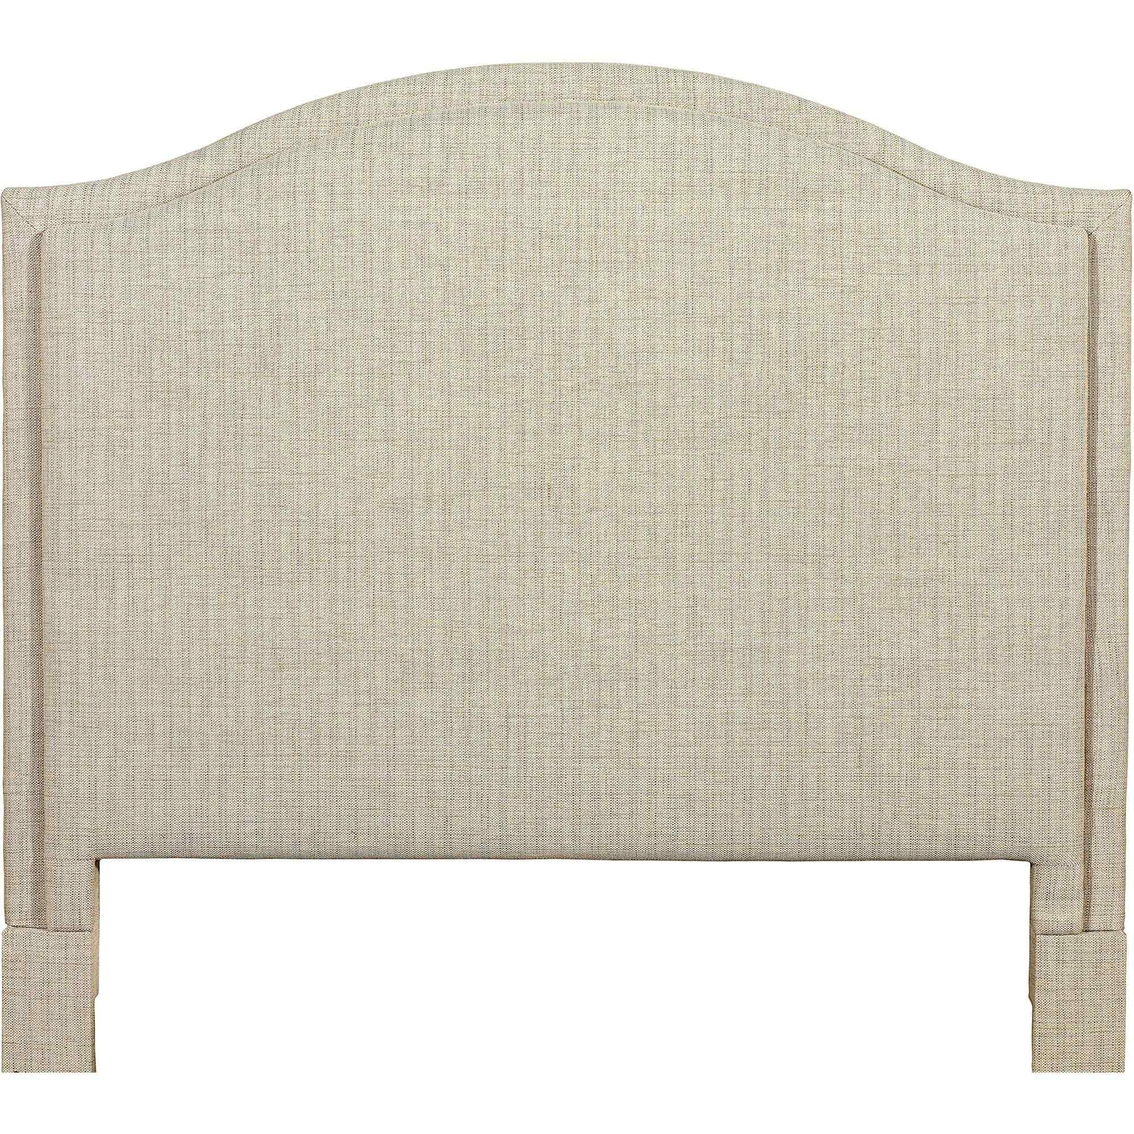 Hgtv Home Design Studio By Bassett Vienna Arched Headboard | Beds ...